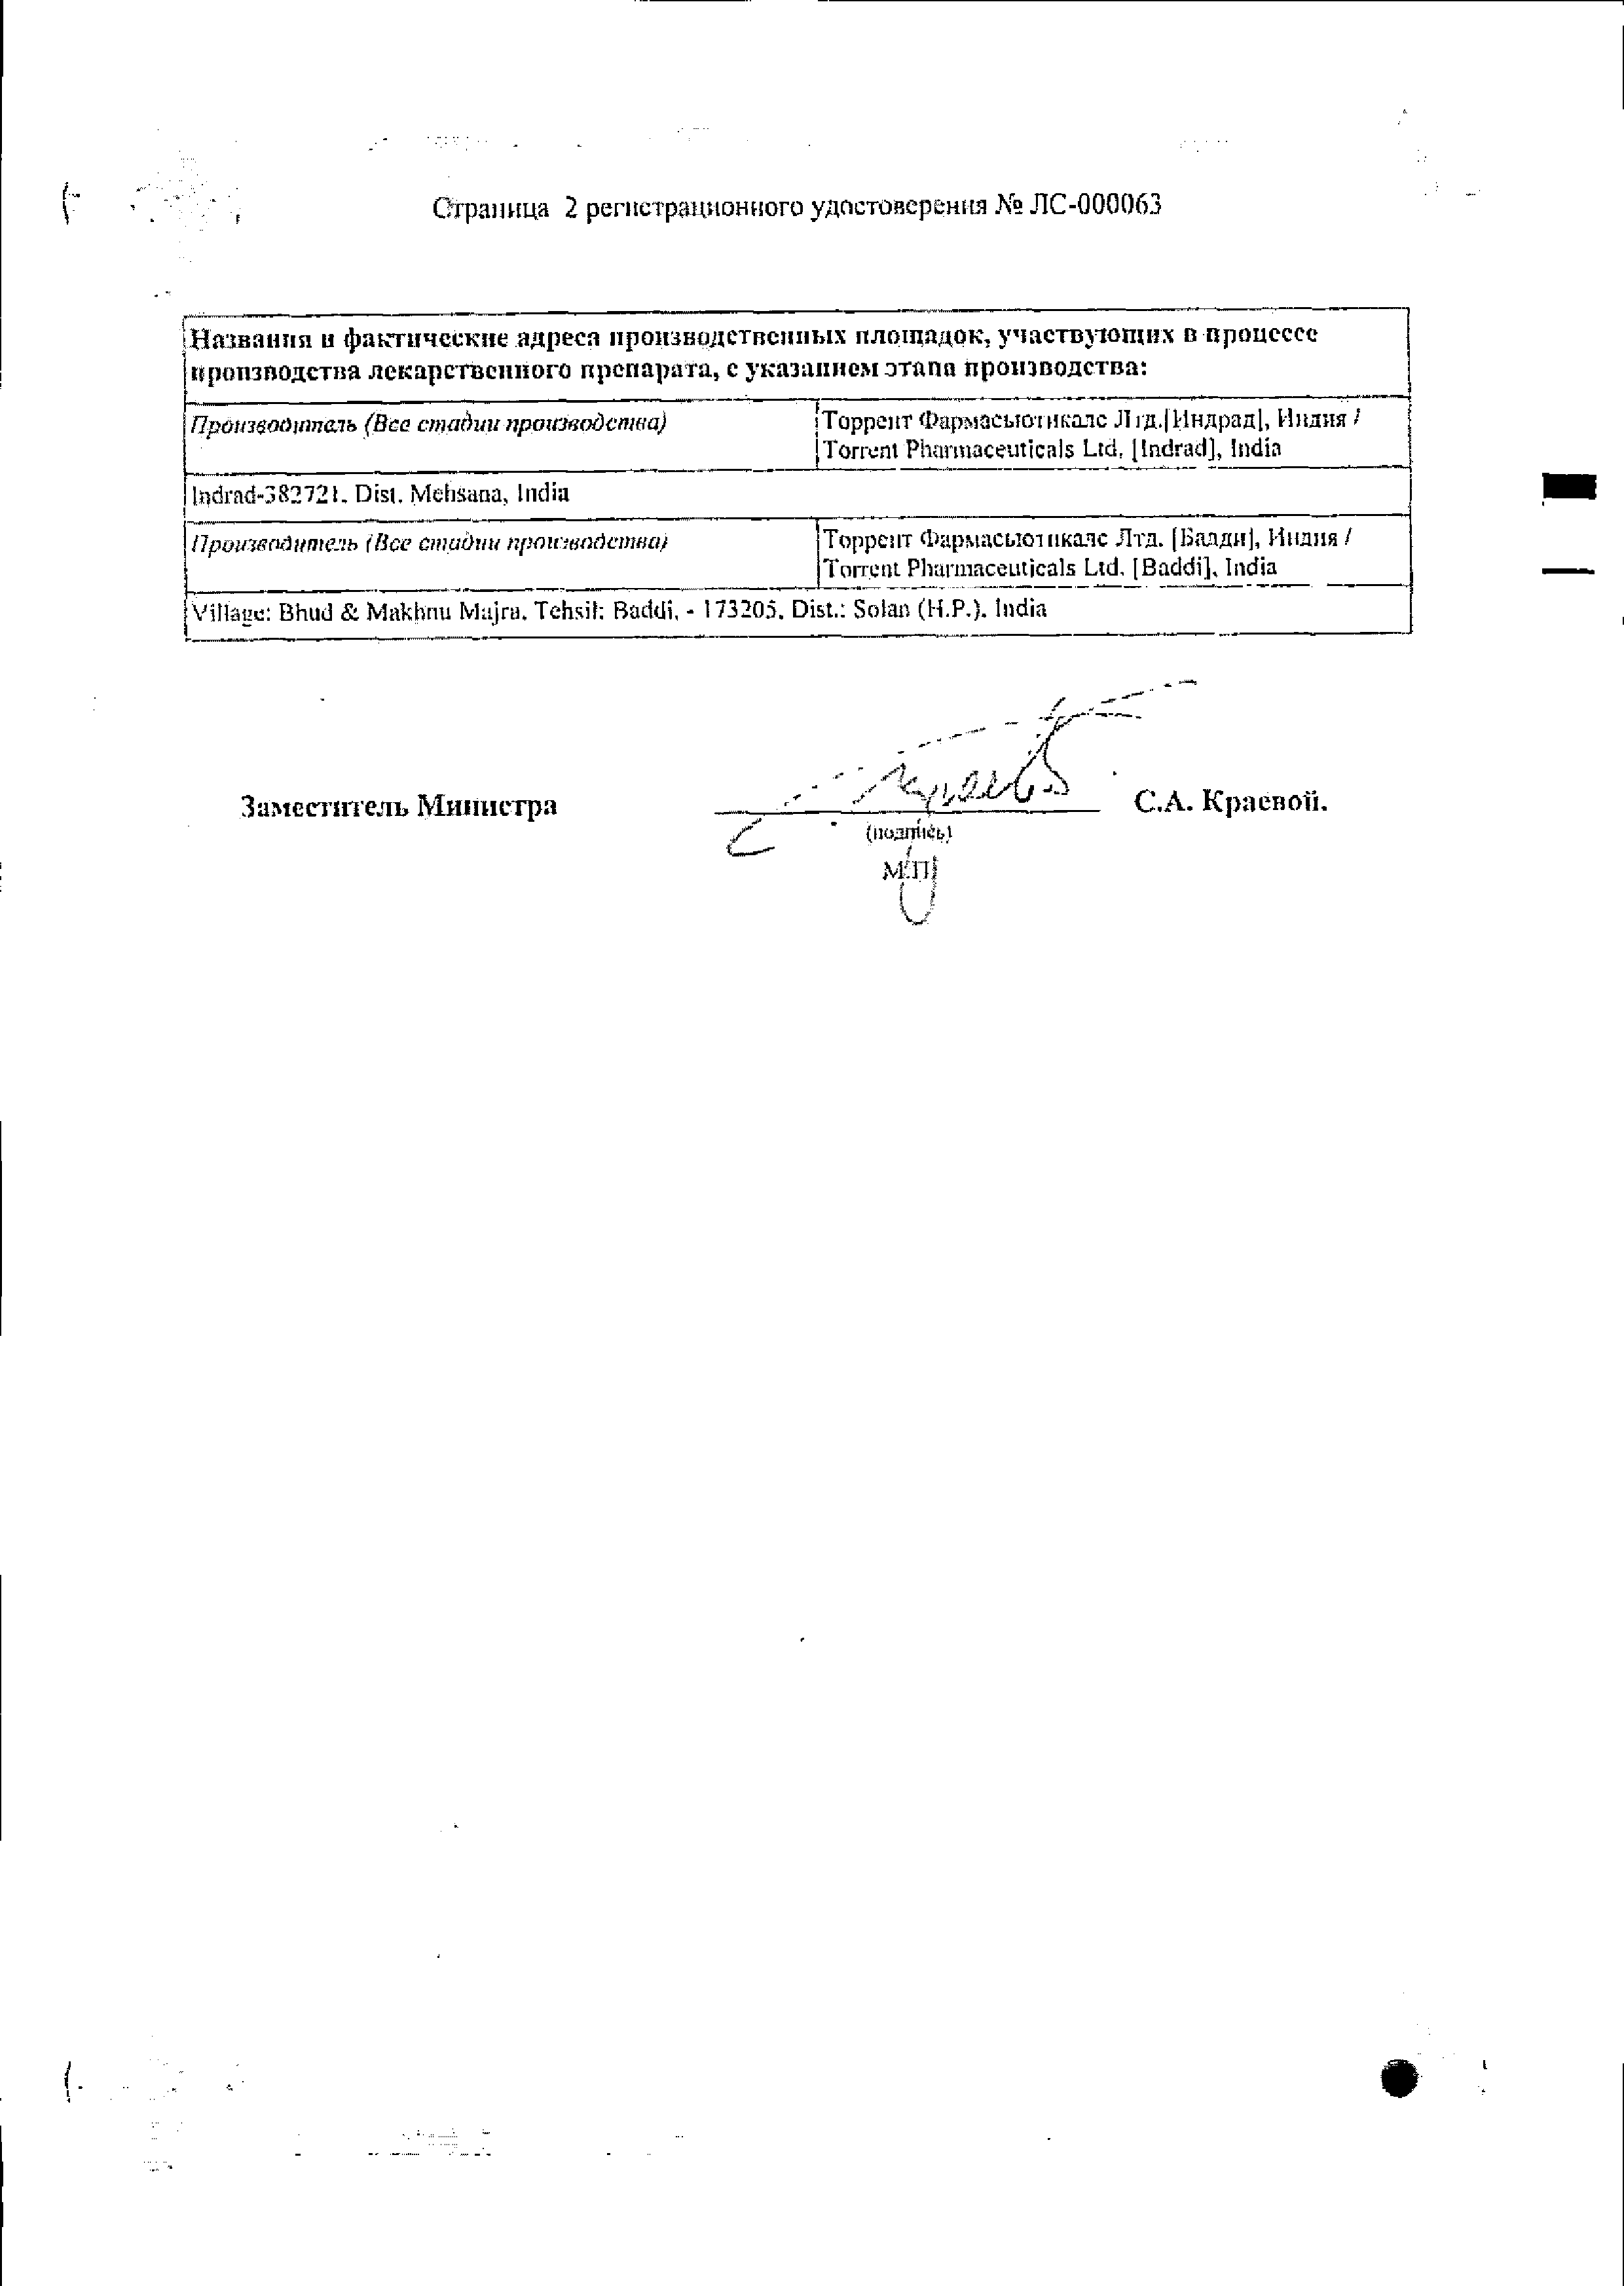 Серената сертификат